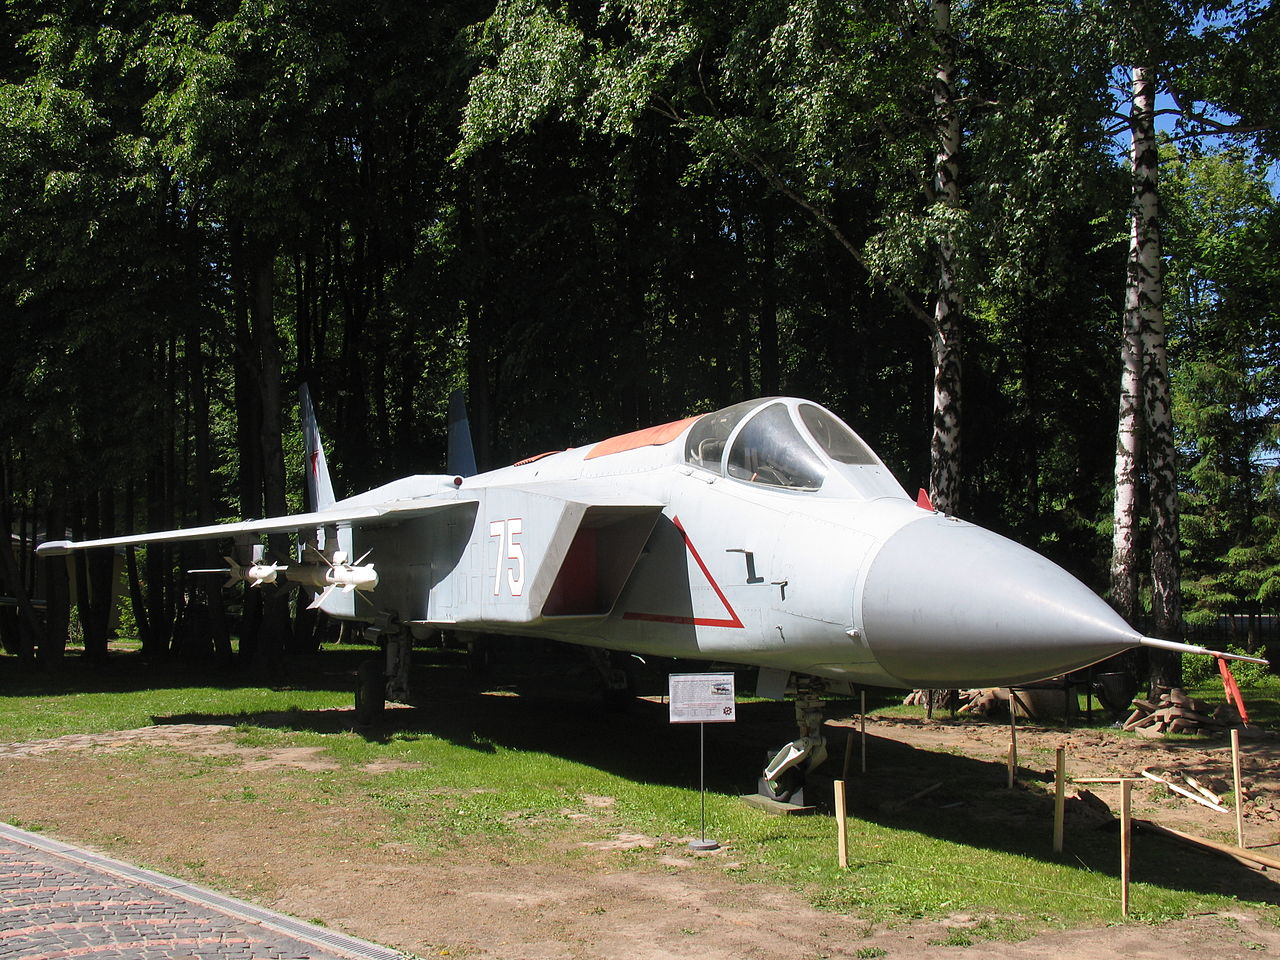 1280px-Yakovlev_Yak-141_Museum_of_techni